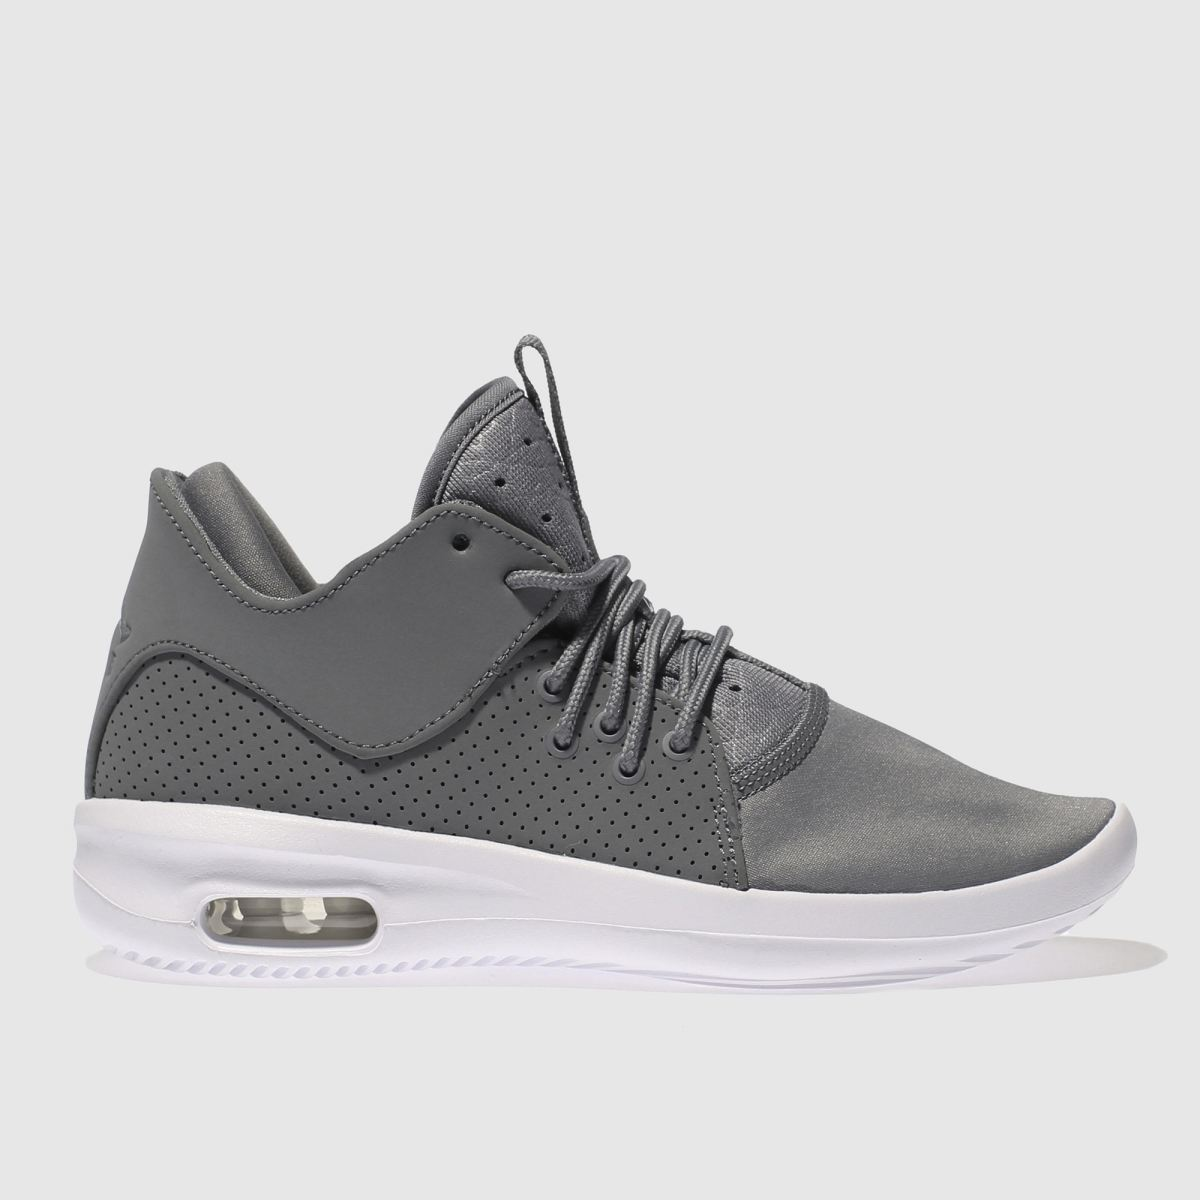 Nike Jordan Grey First Class Youth Trainers